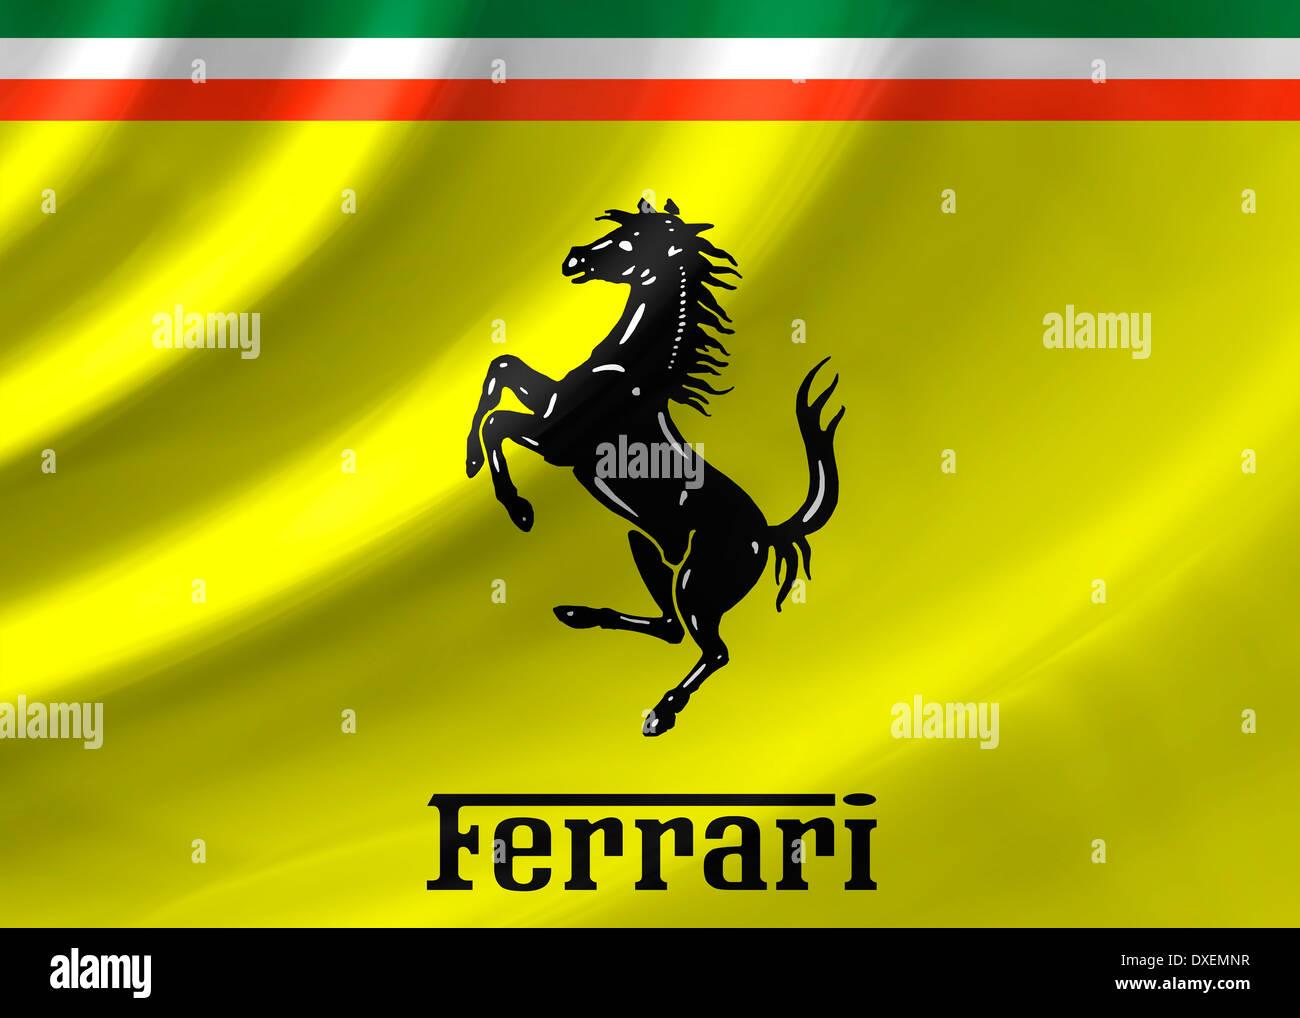 Ferrari Logo Flag Symbol Icon High Resolution Stock Photography and Images - Alamy